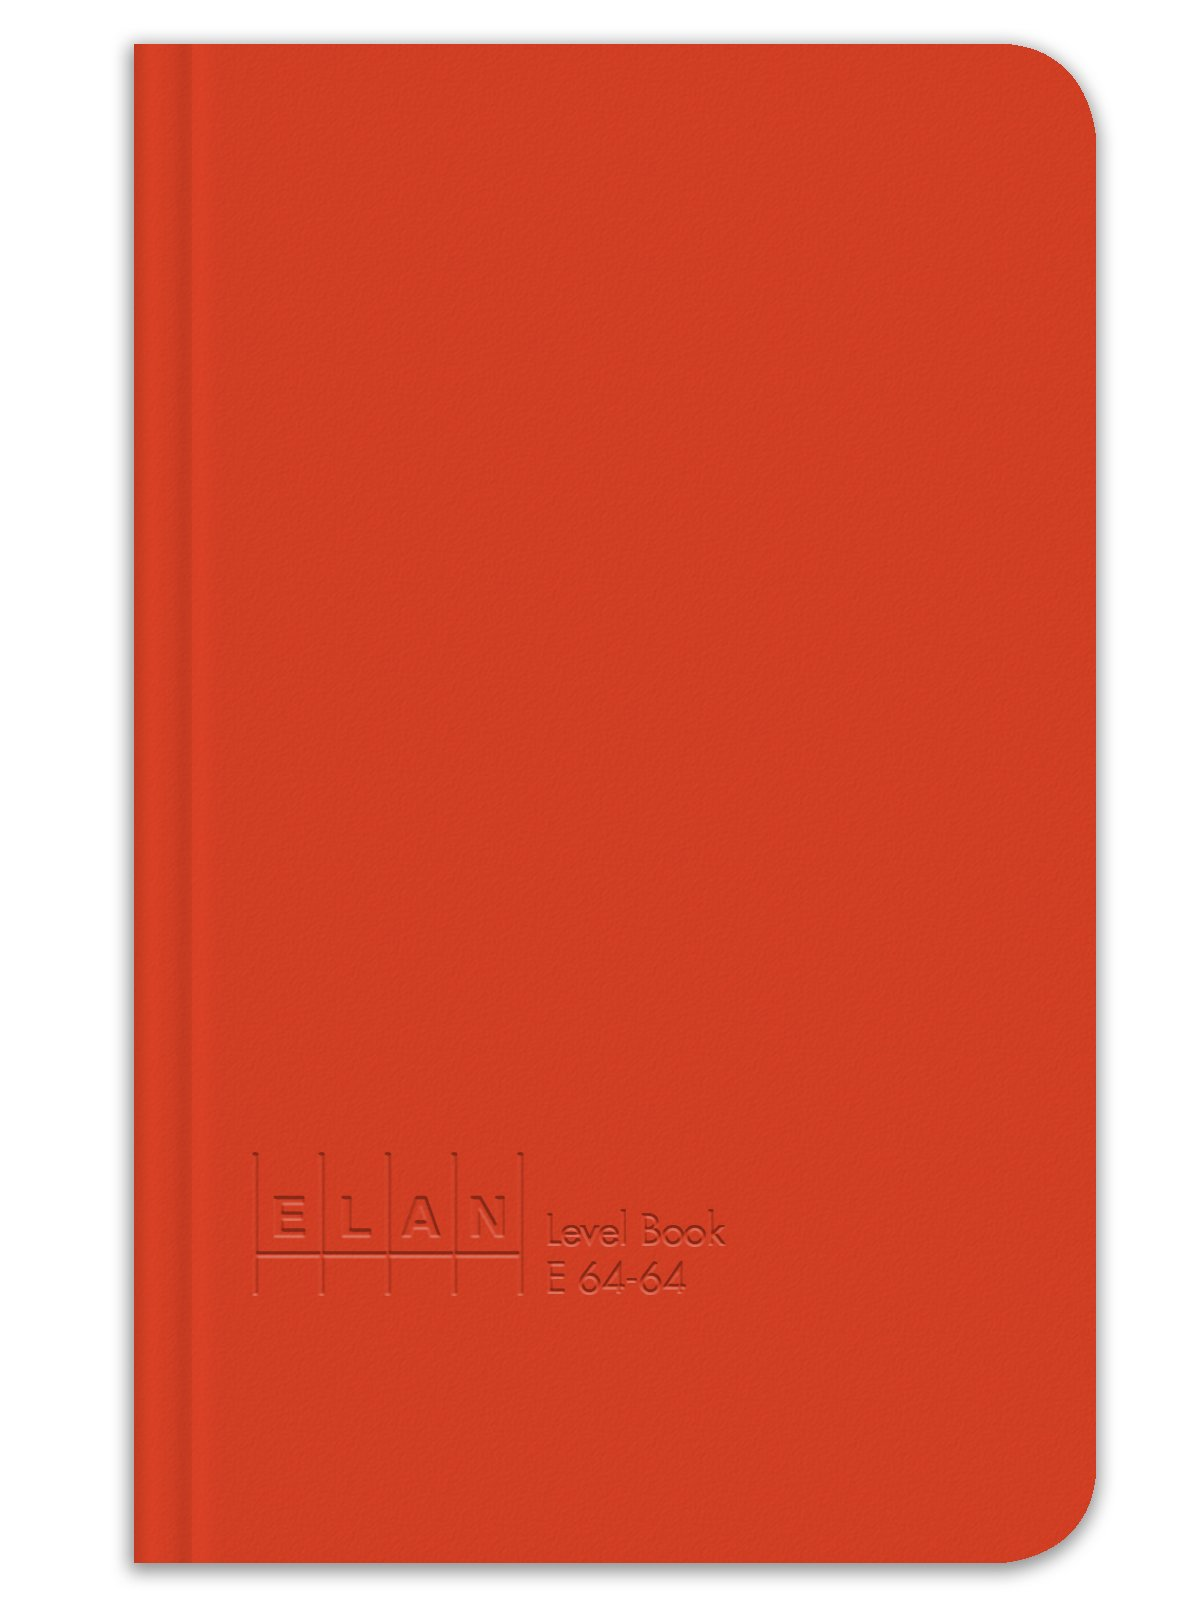 Elan Publishing Company E64-64 Level Book 4 ⅝ x 7 ¼, Bright Orange Cover (Pack of 12) by Elan Publishing Company